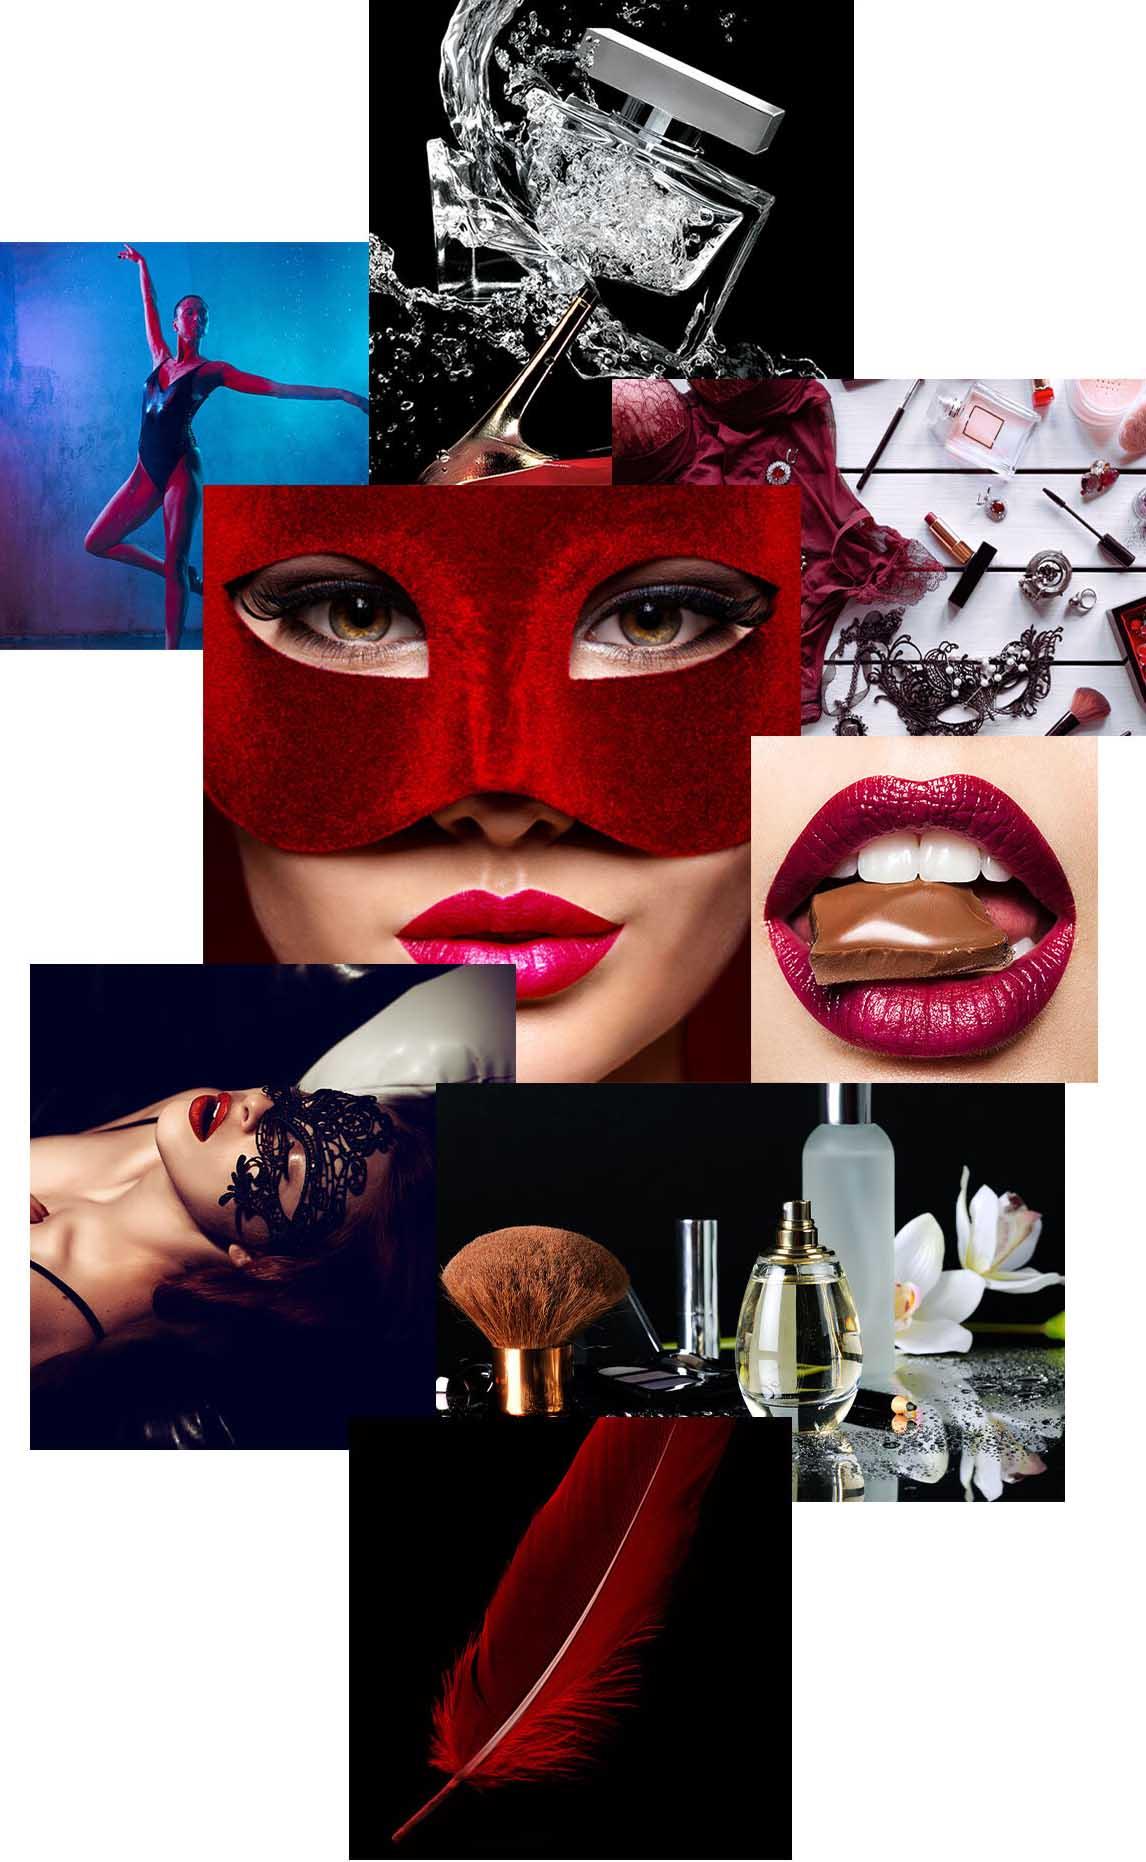 lindsay giguiere, feravana,  sensuality, perfumes, candles